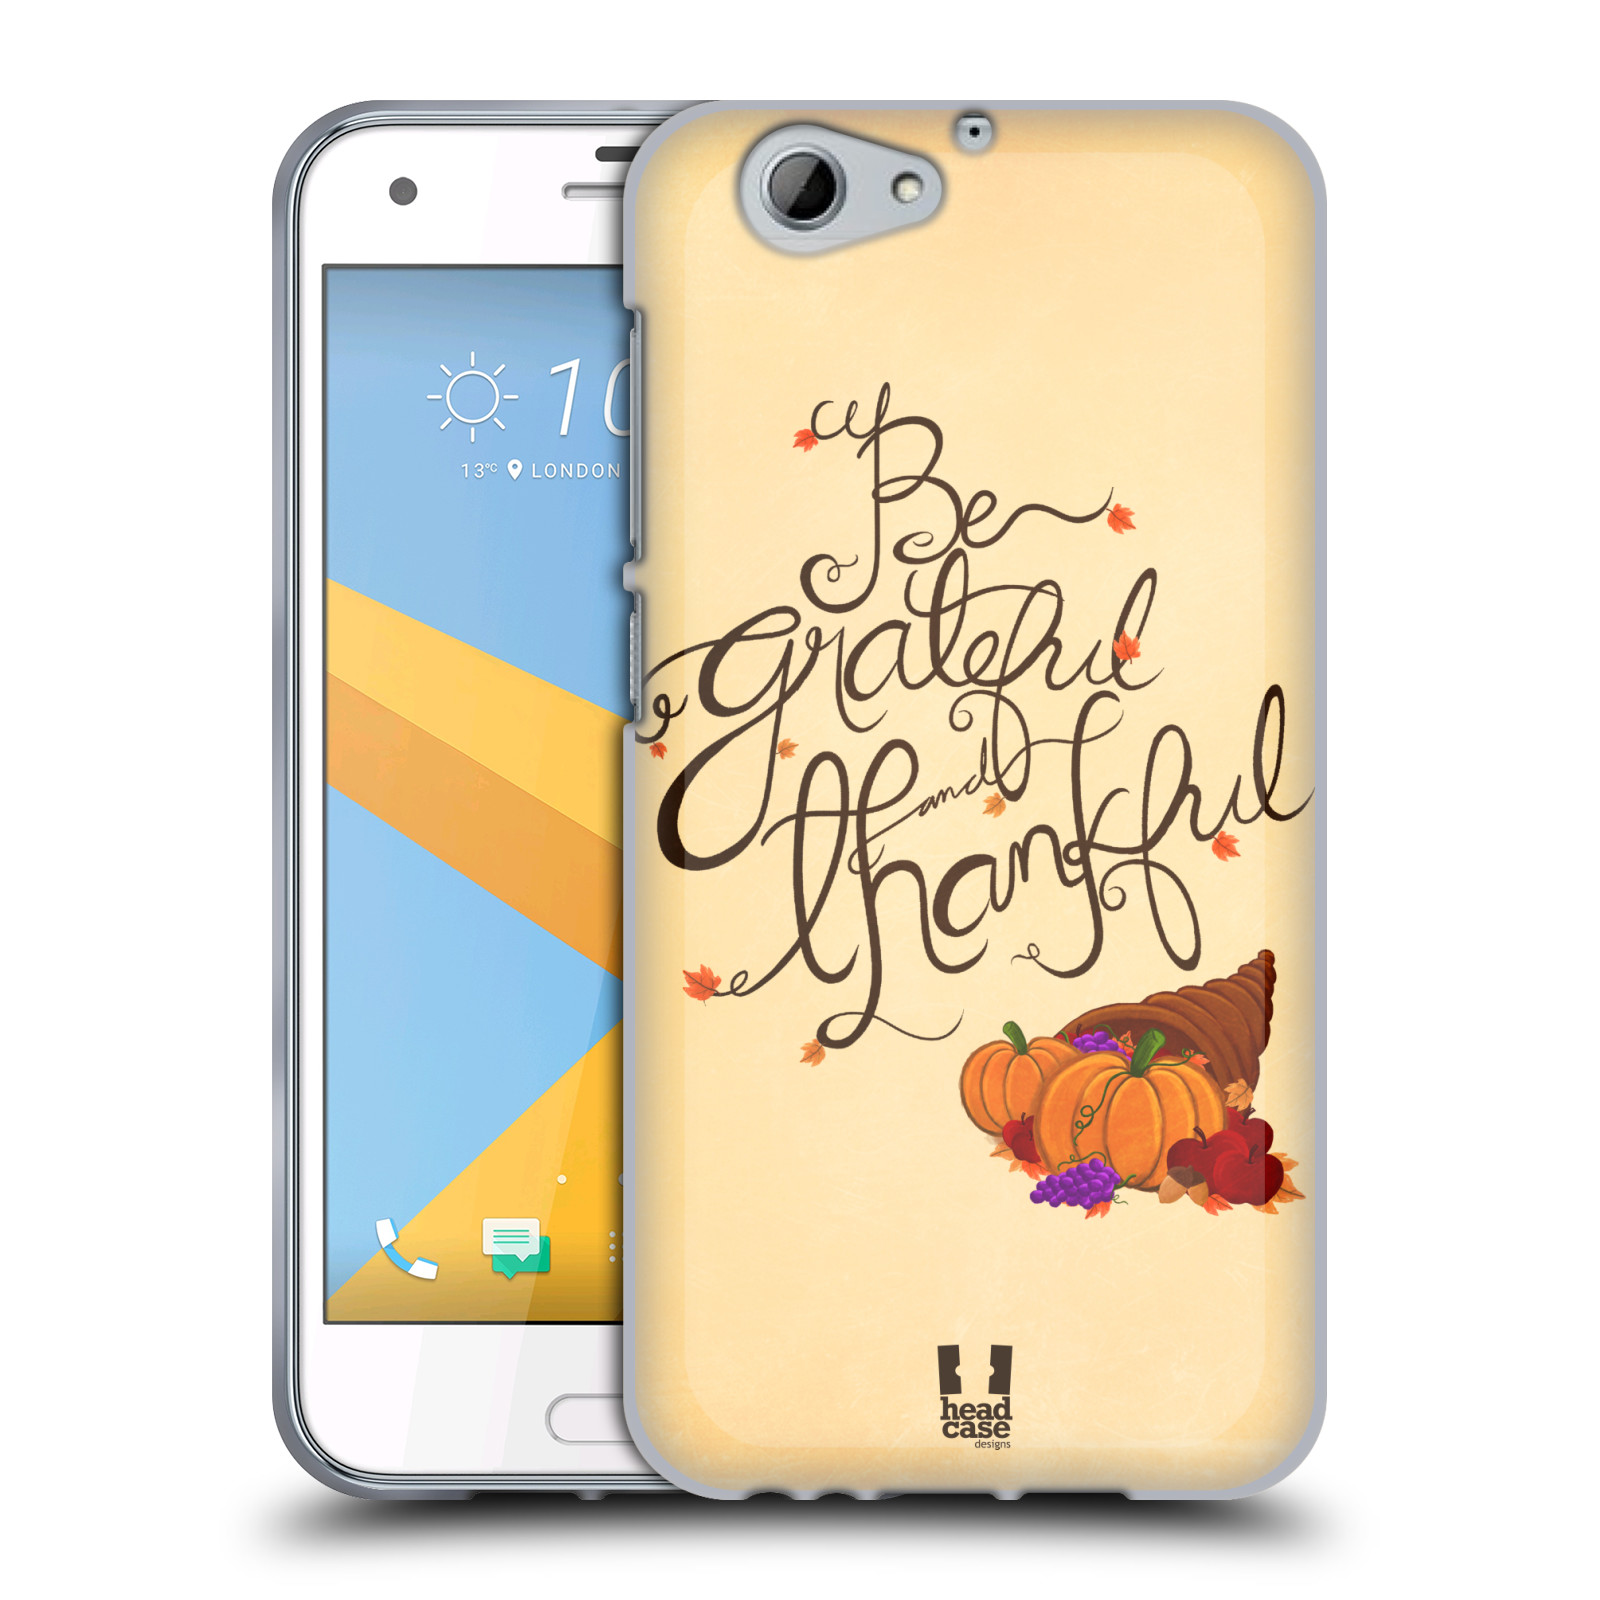 HEAD-CASE-DESIGNS-TIPOGRAFIA-DI-THANKSGIVING-CASE-IN-GEL-PER-HTC-ONE-A9s